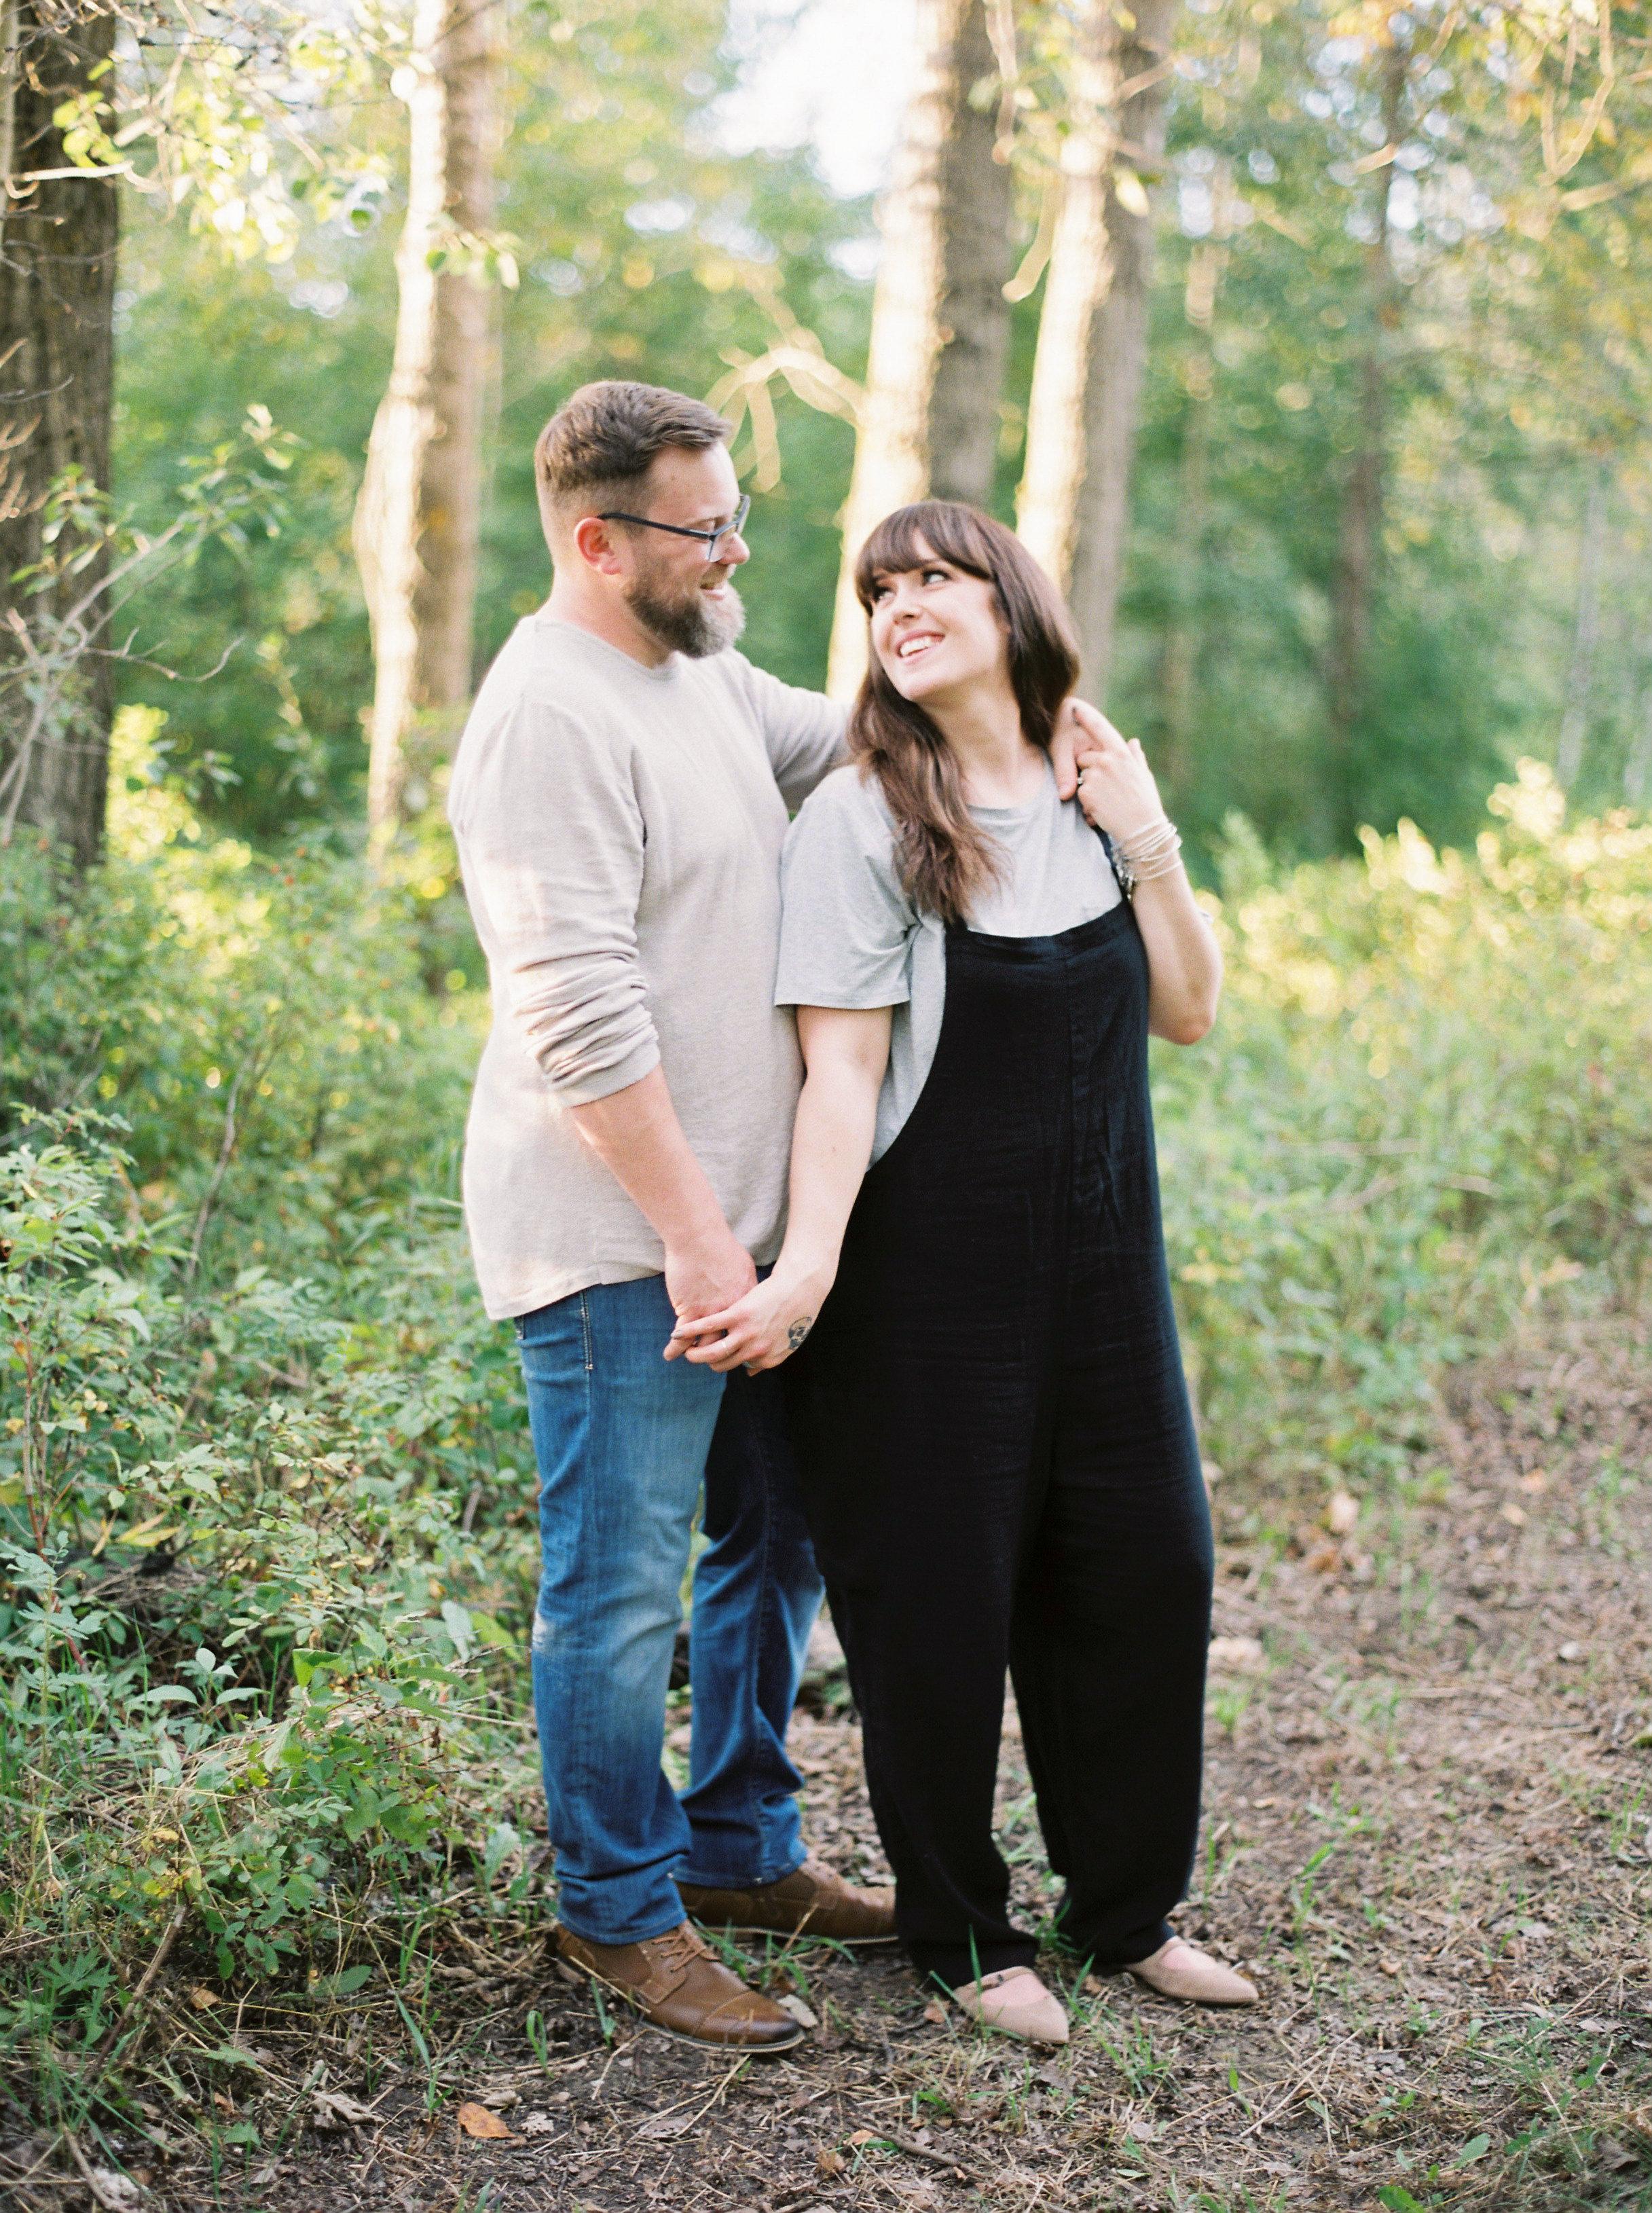 Christine&Sean_FirstGlanceStudios-13.jpg